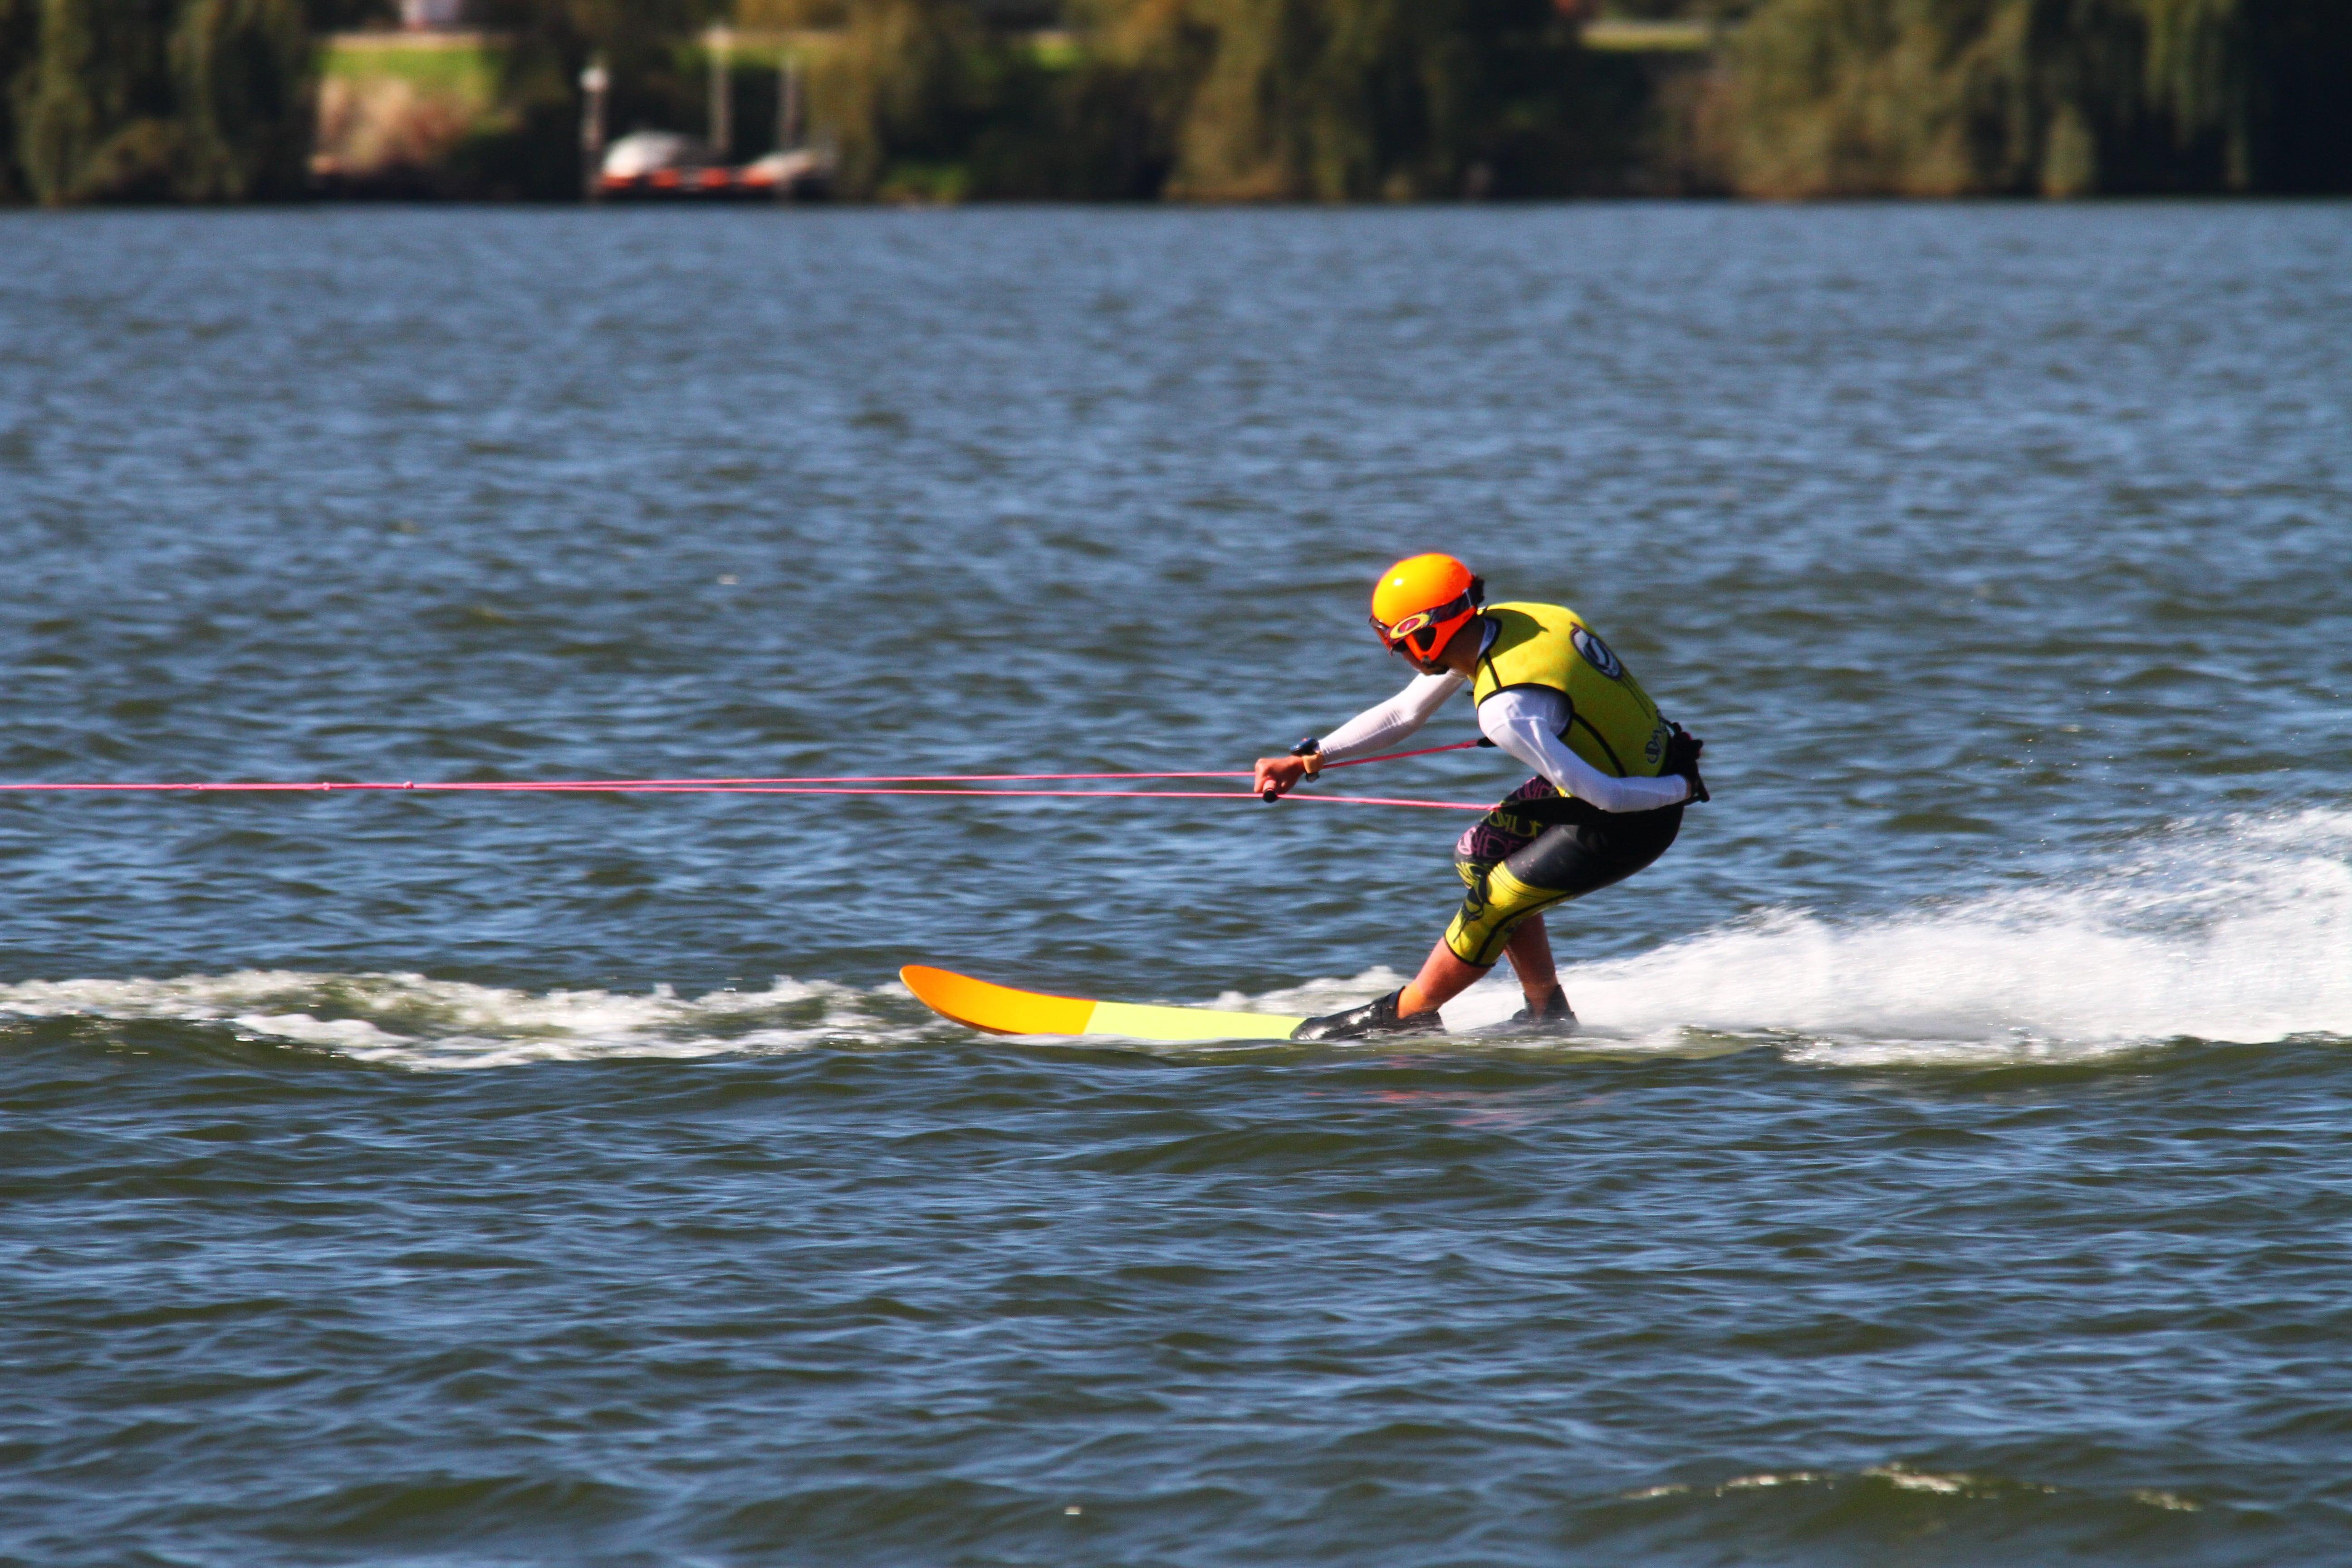 Max Duckworth | Sport